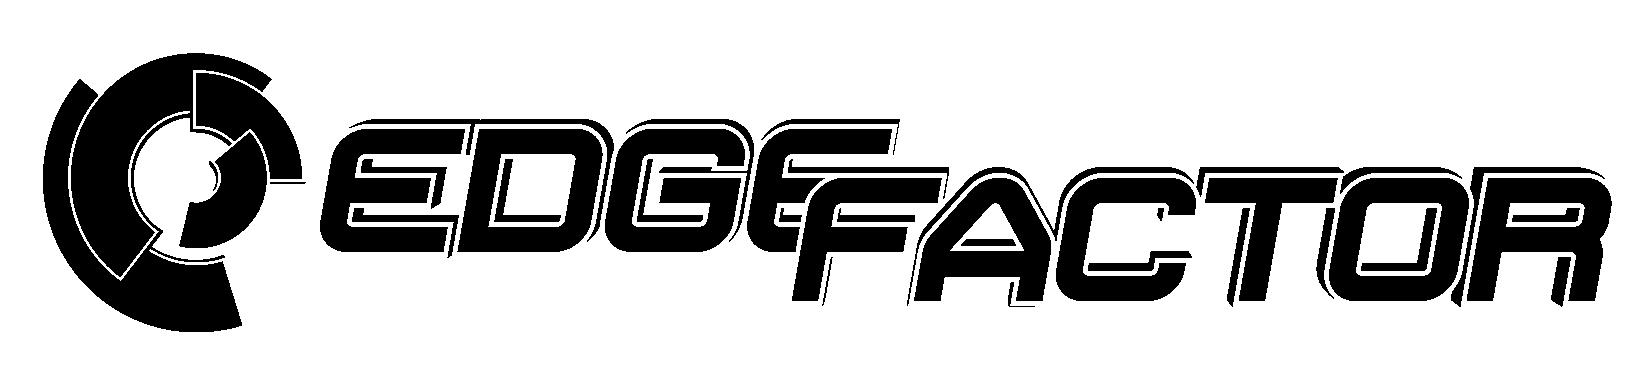 EdgeFactor logos 2018 black